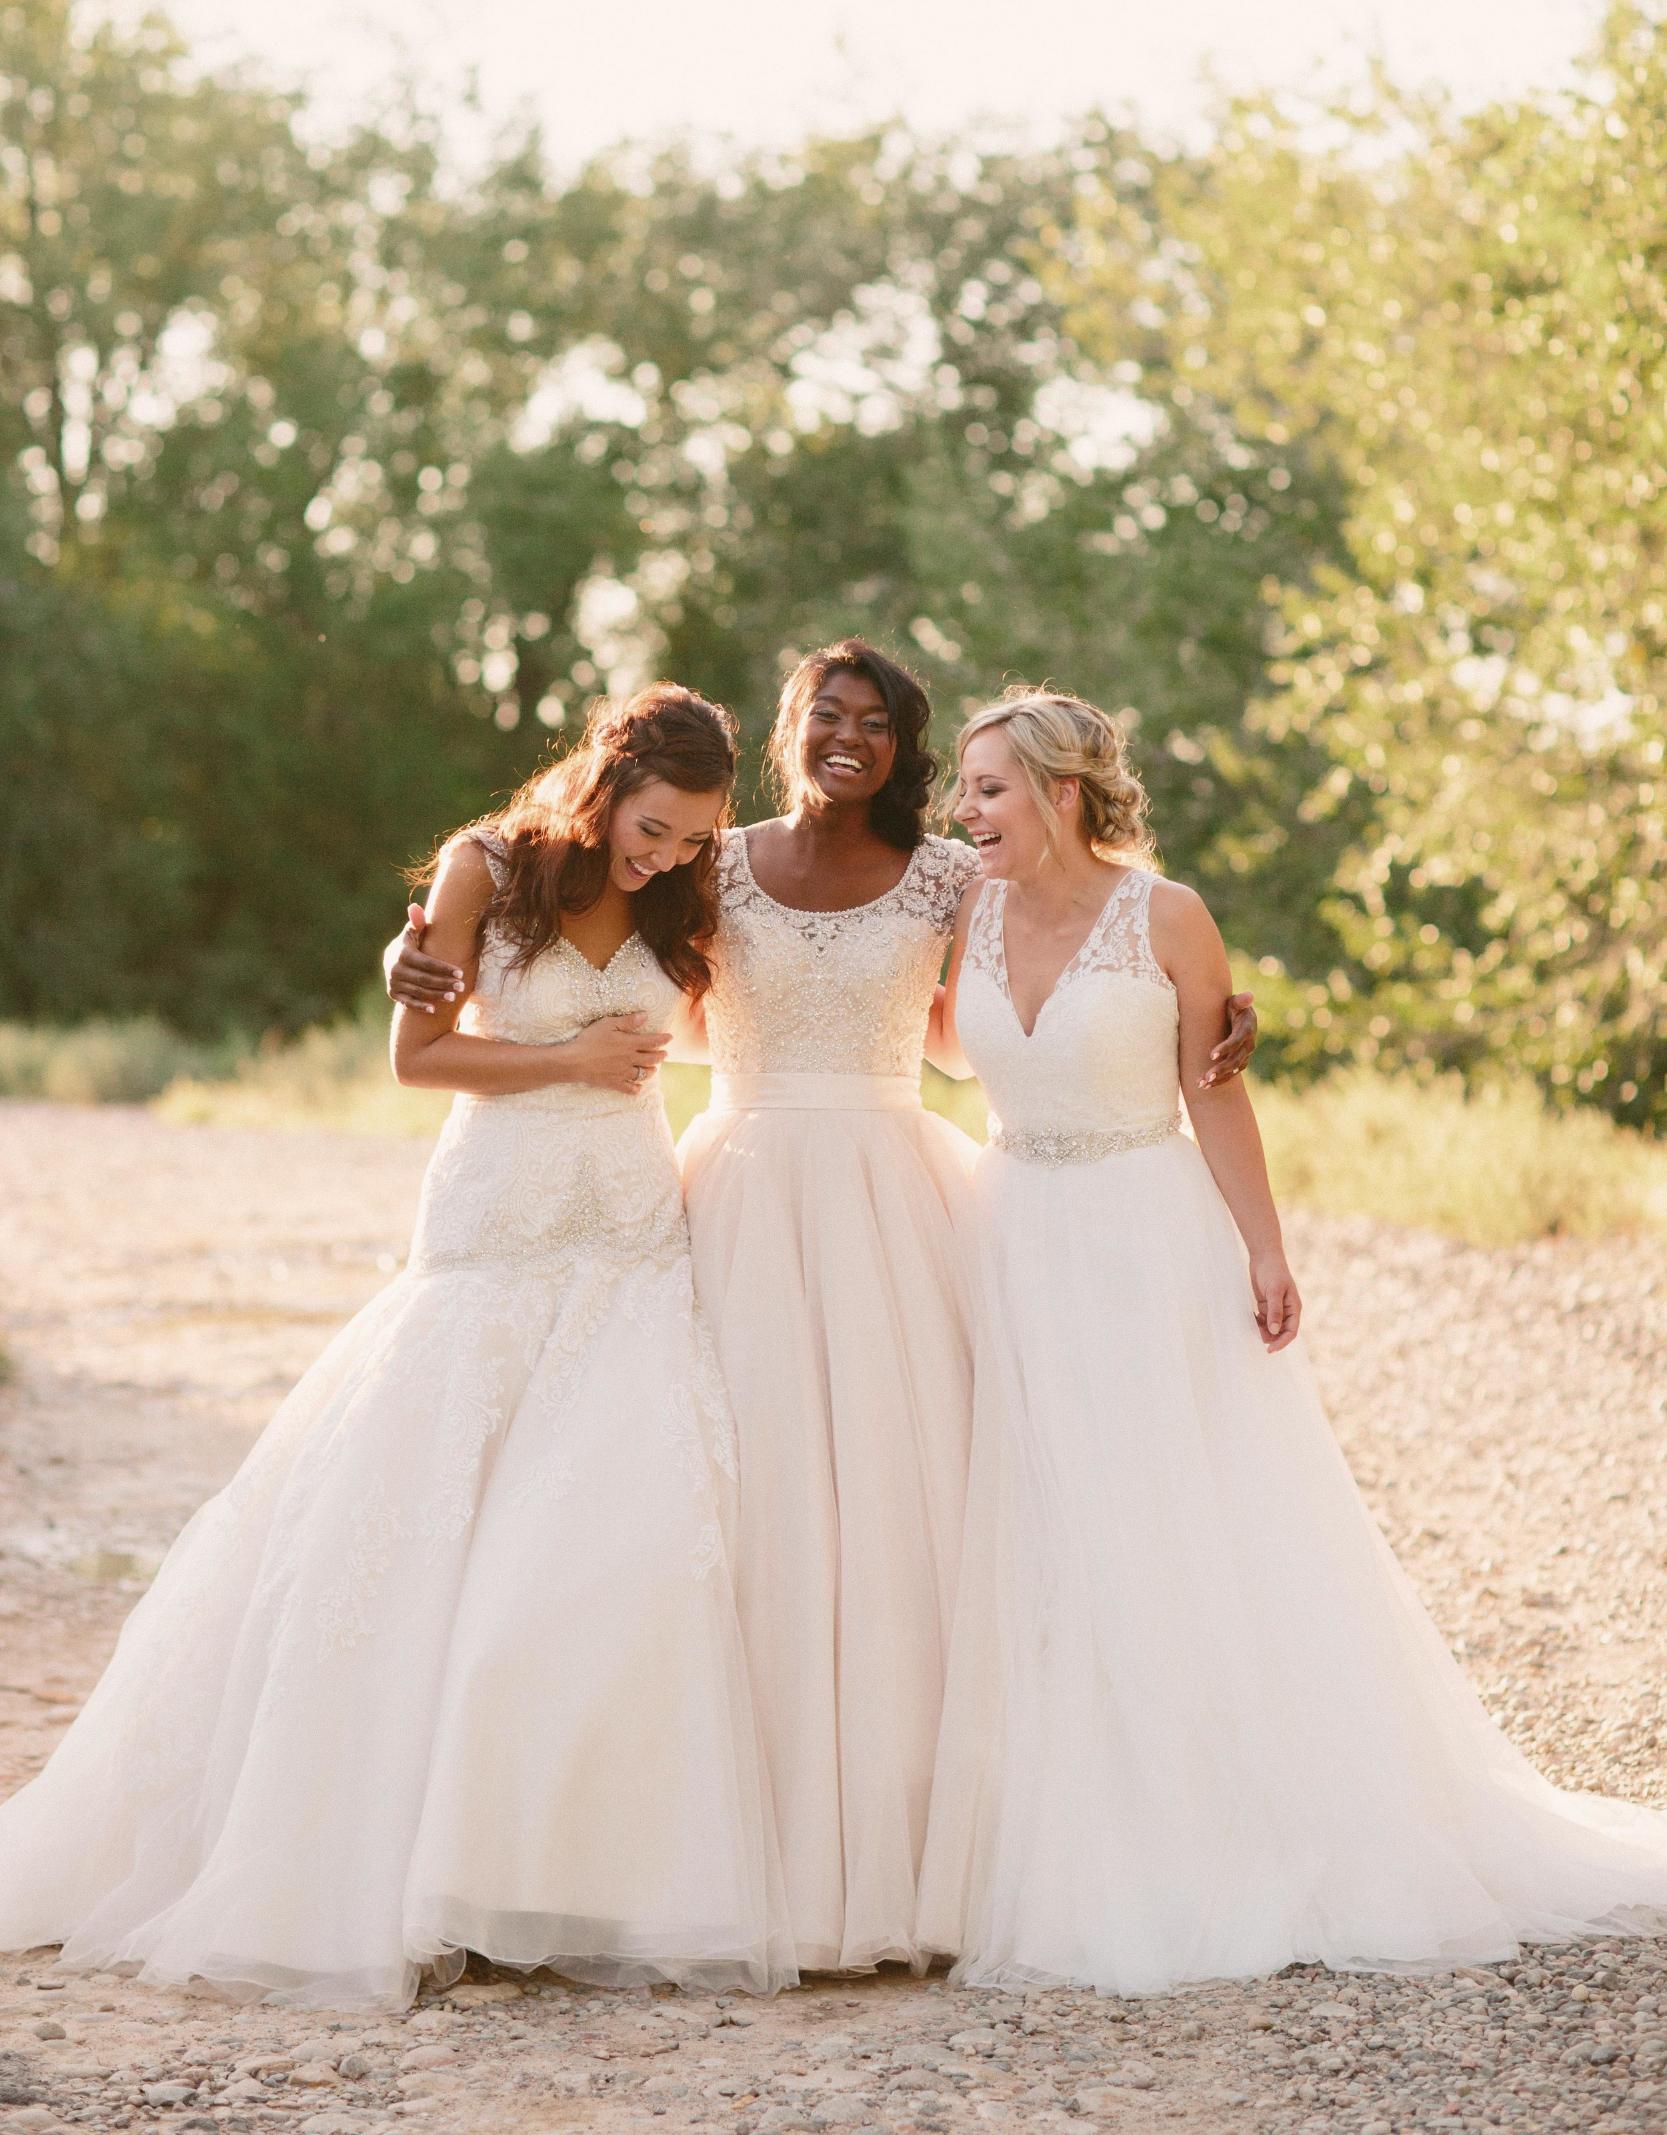 Grand Junction & Palisade wedding photographer Cat Mayer Studio